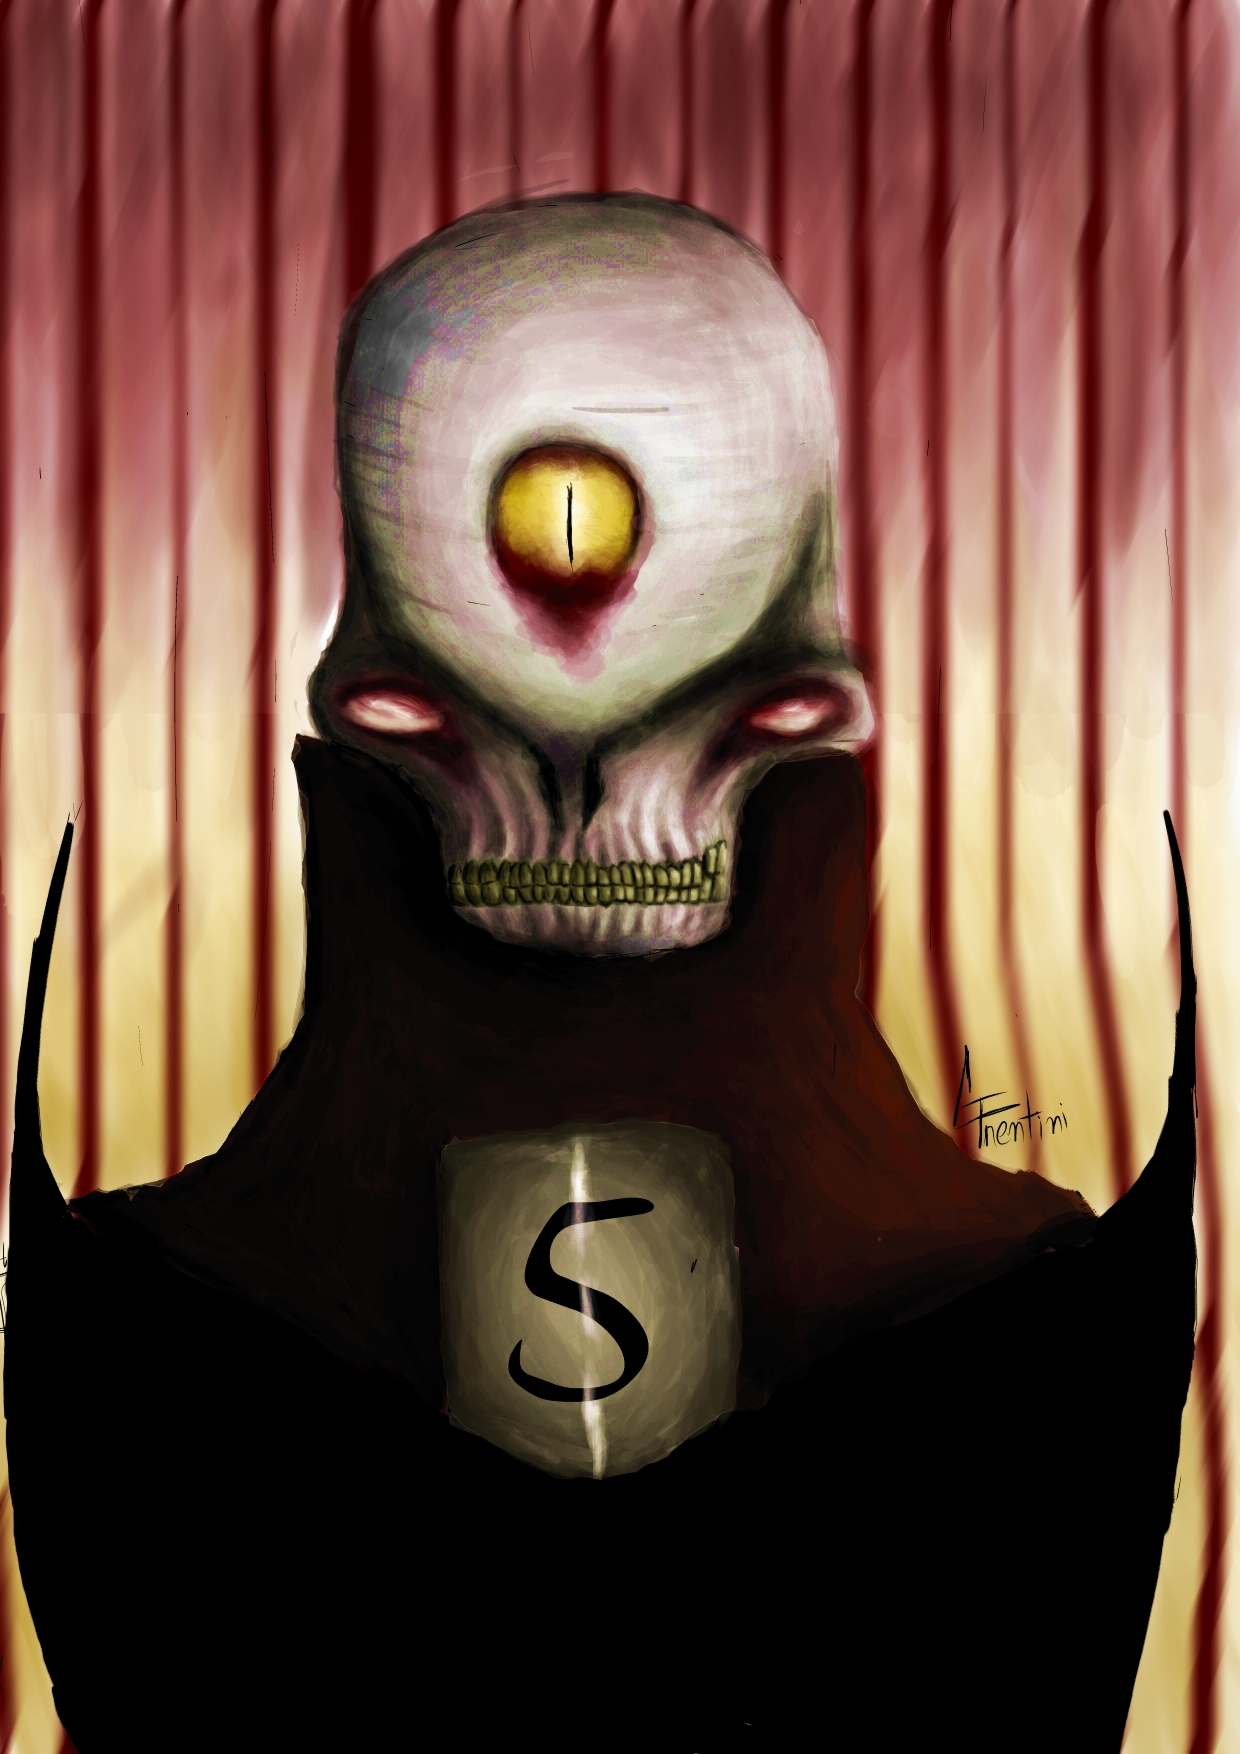 Number Five - Biloxih